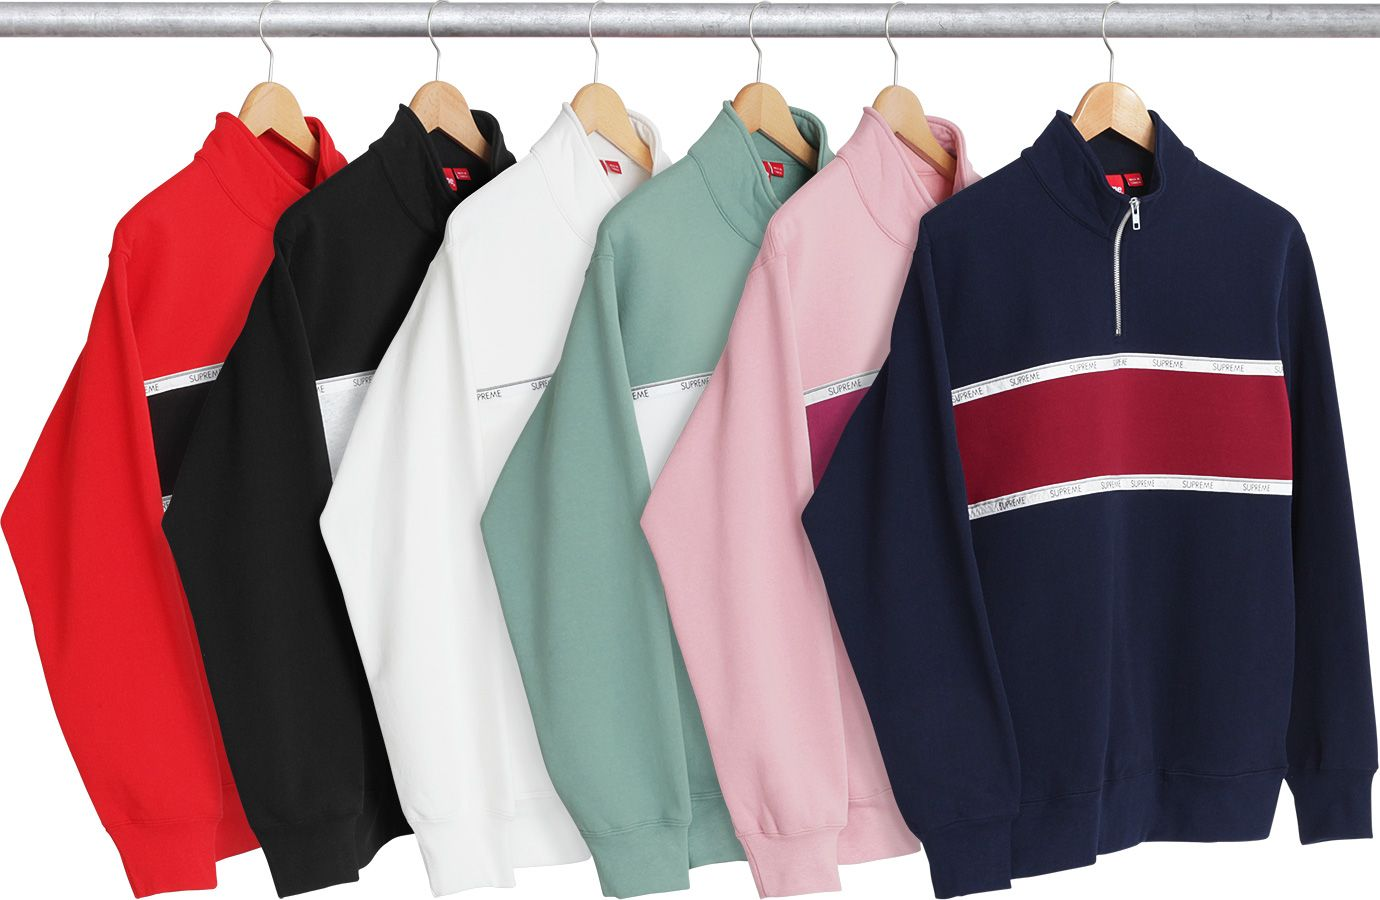 Supreme Stripe Hooded Sweatshirt Supreme Clothing Hooded Sweatshirts Sweatshirts [ 900 x 1380 Pixel ]